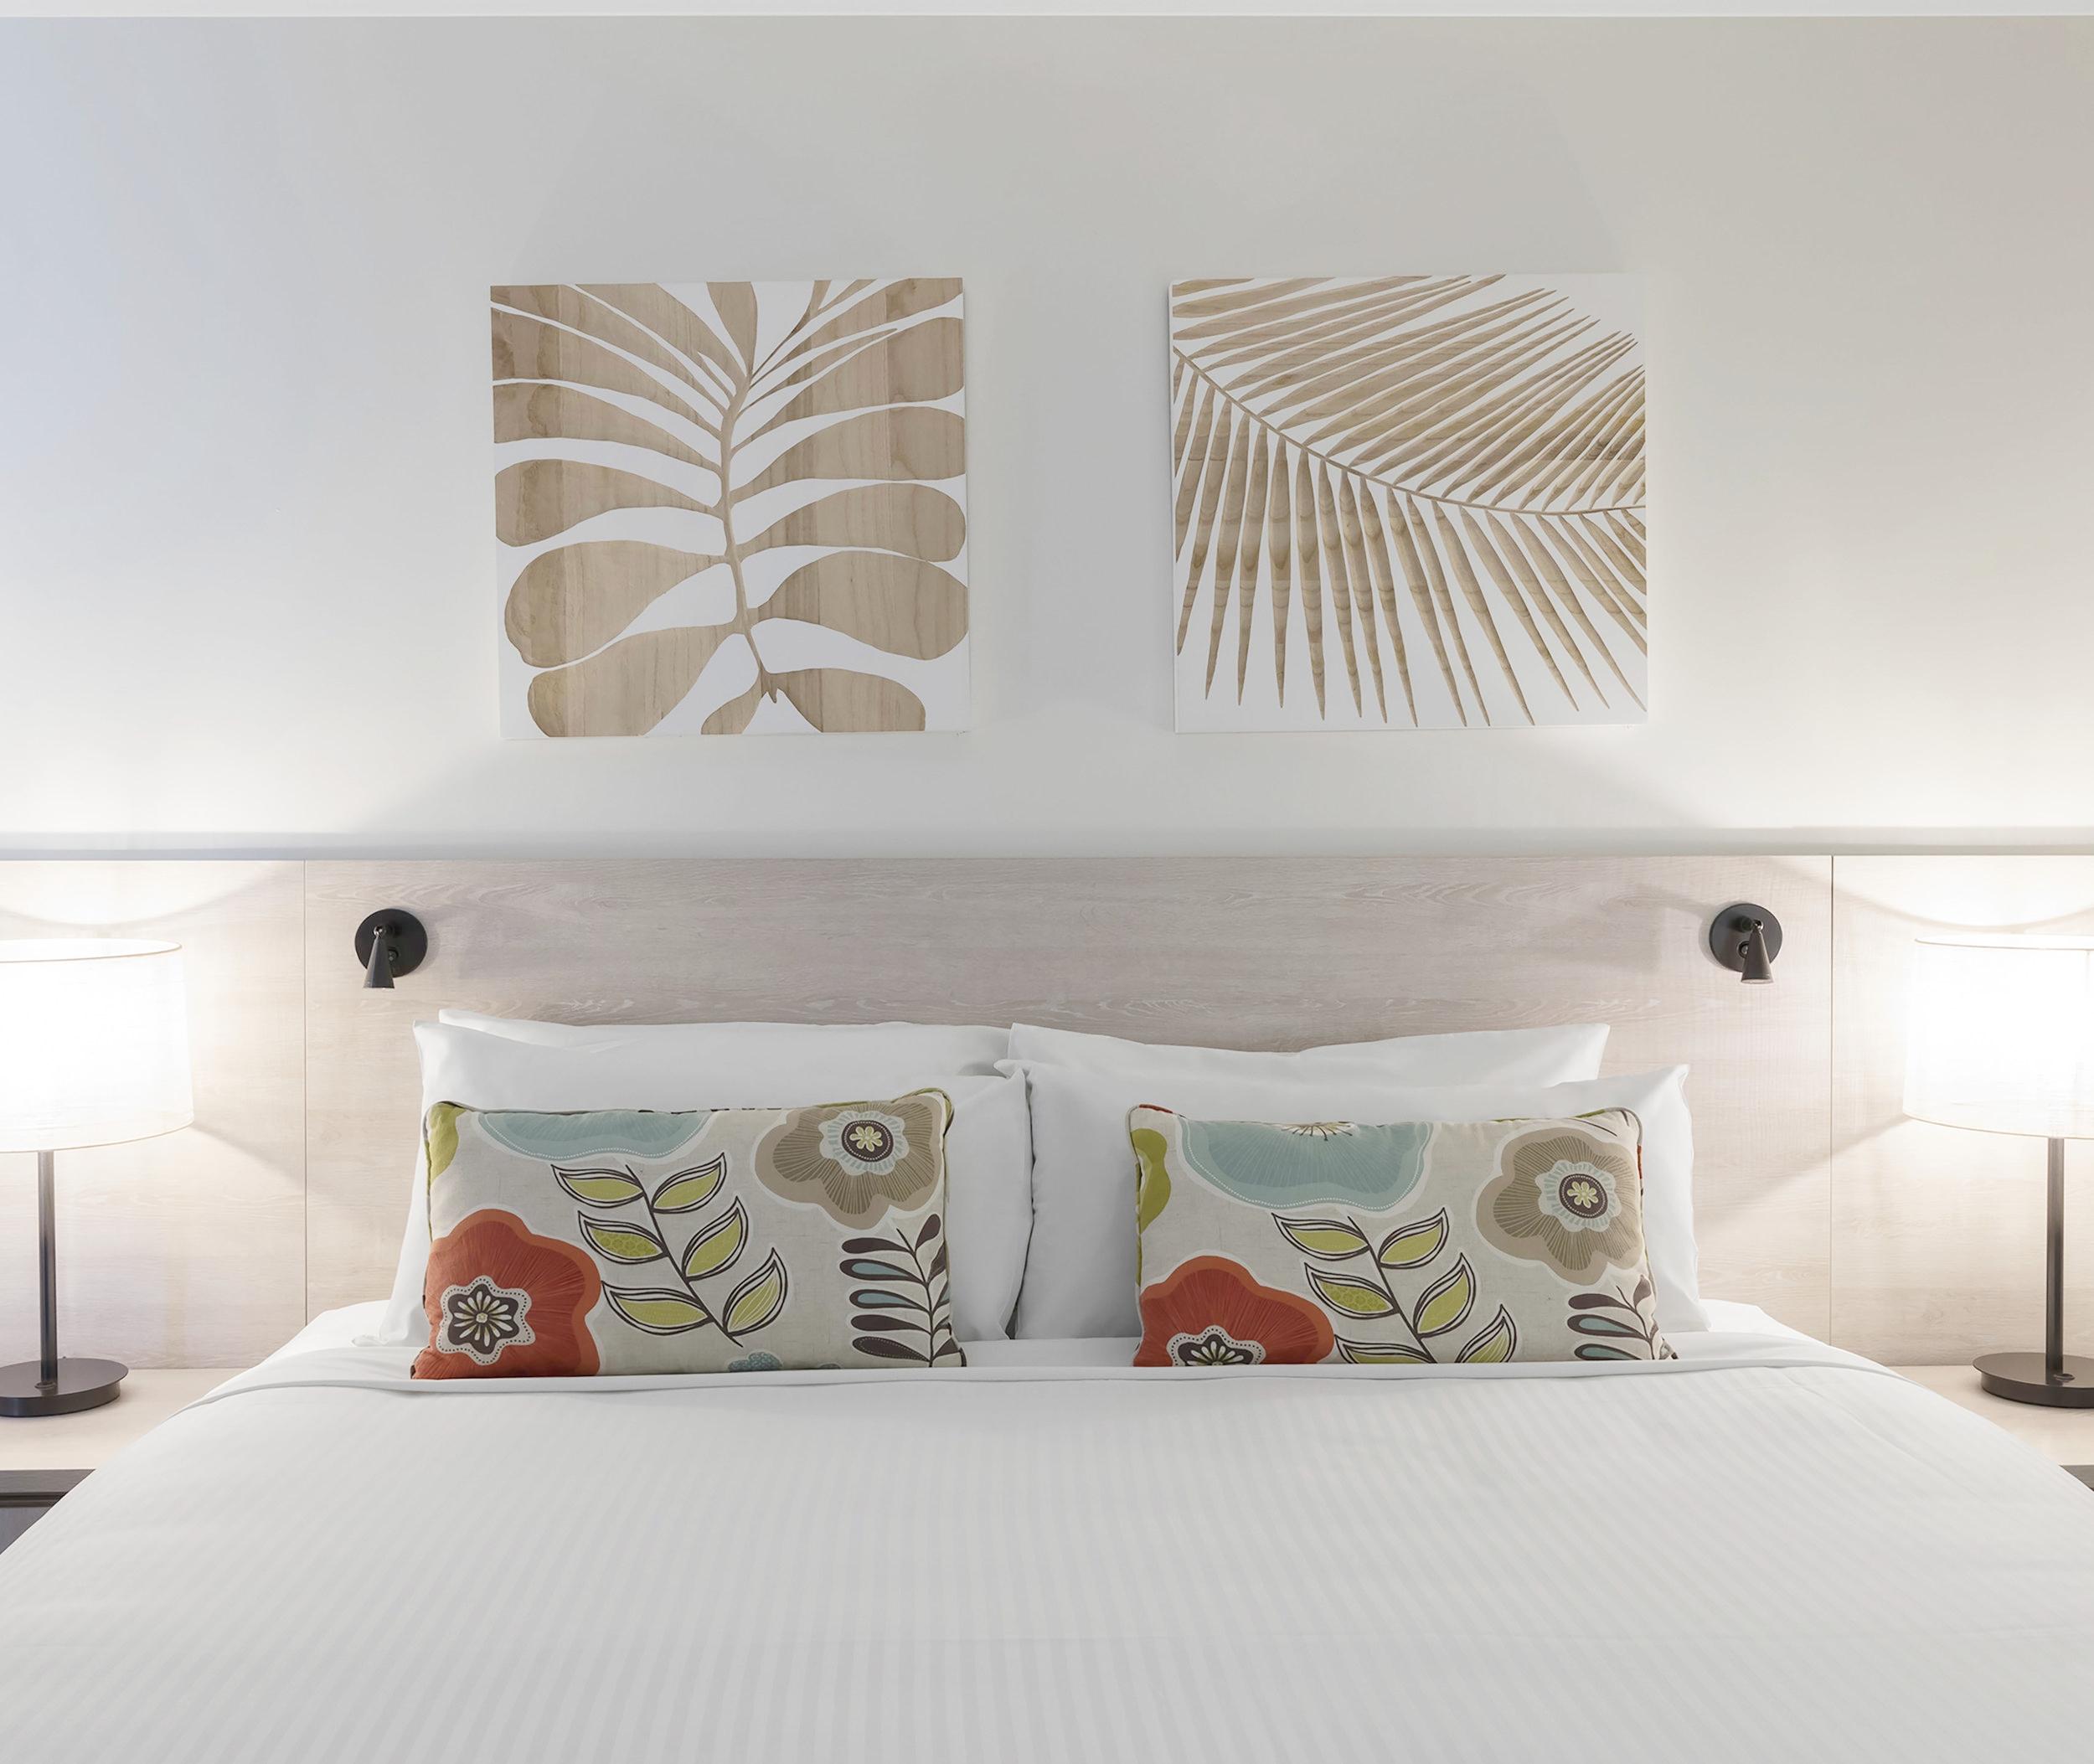 88017367-H1-Oaks_Cypress_Lakes_Resort_2_Bedroom_Premier_Villa.jpg